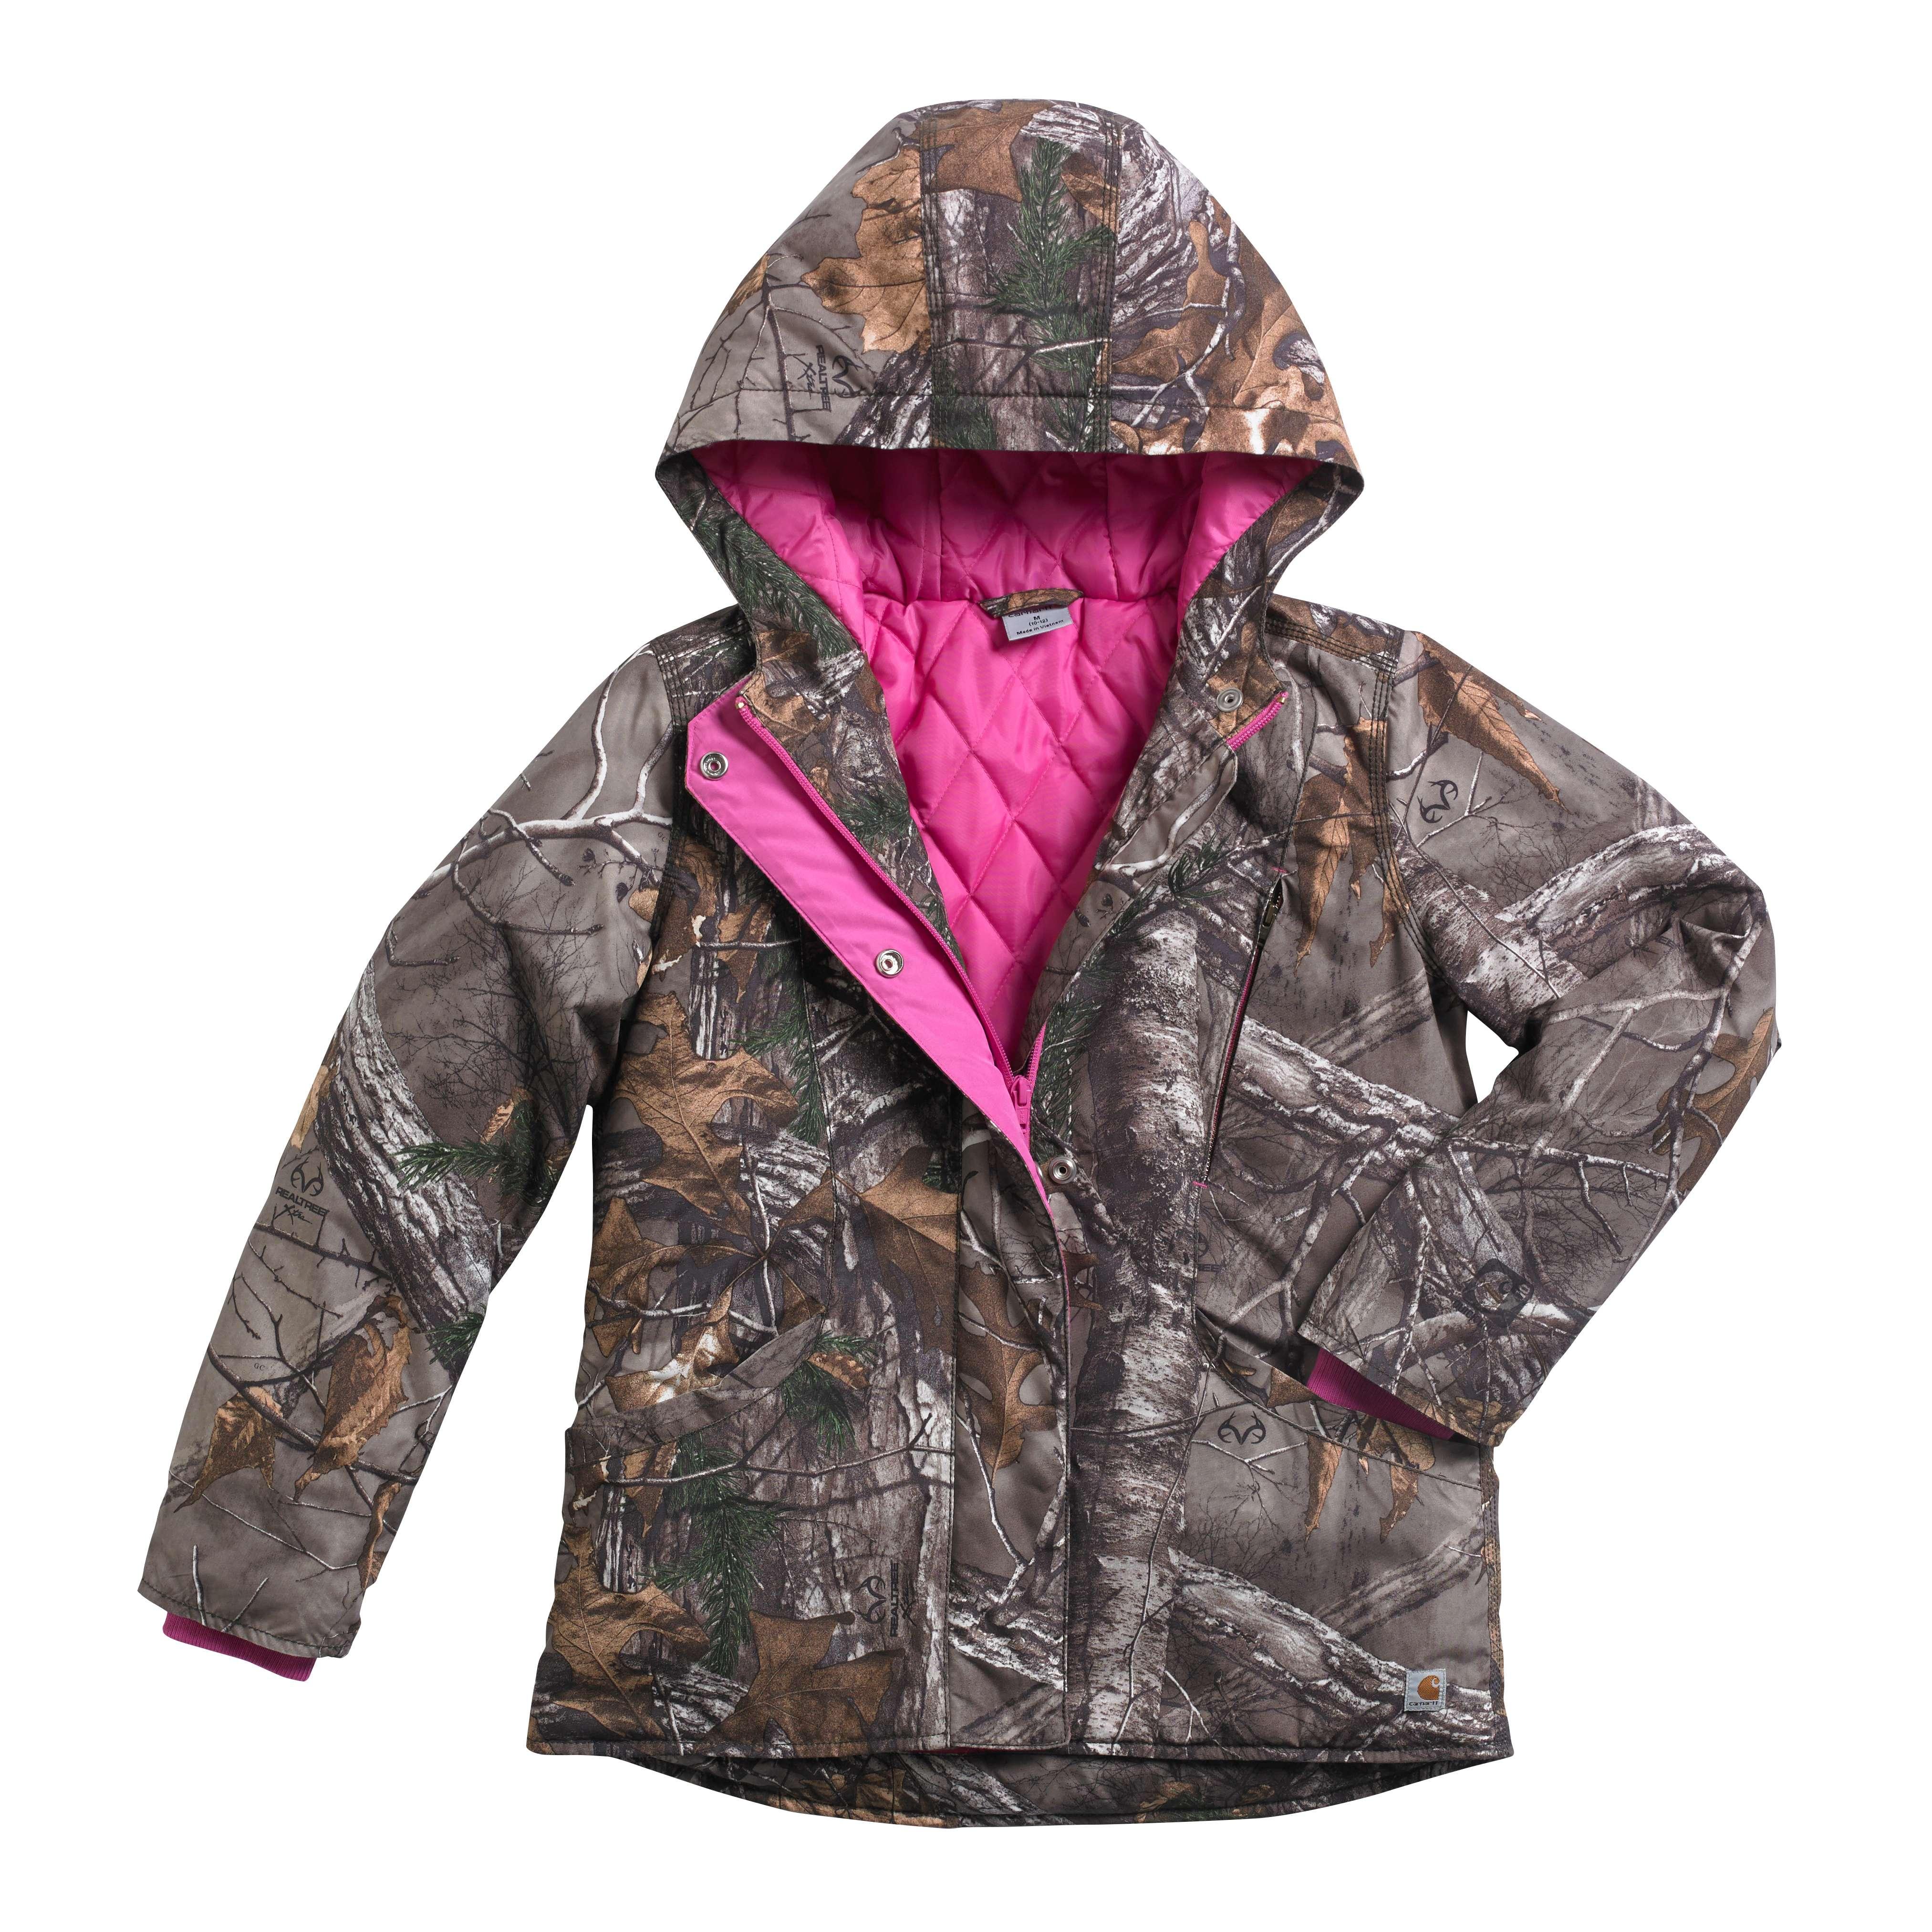 Carhartt Camo Mountain View Jacket